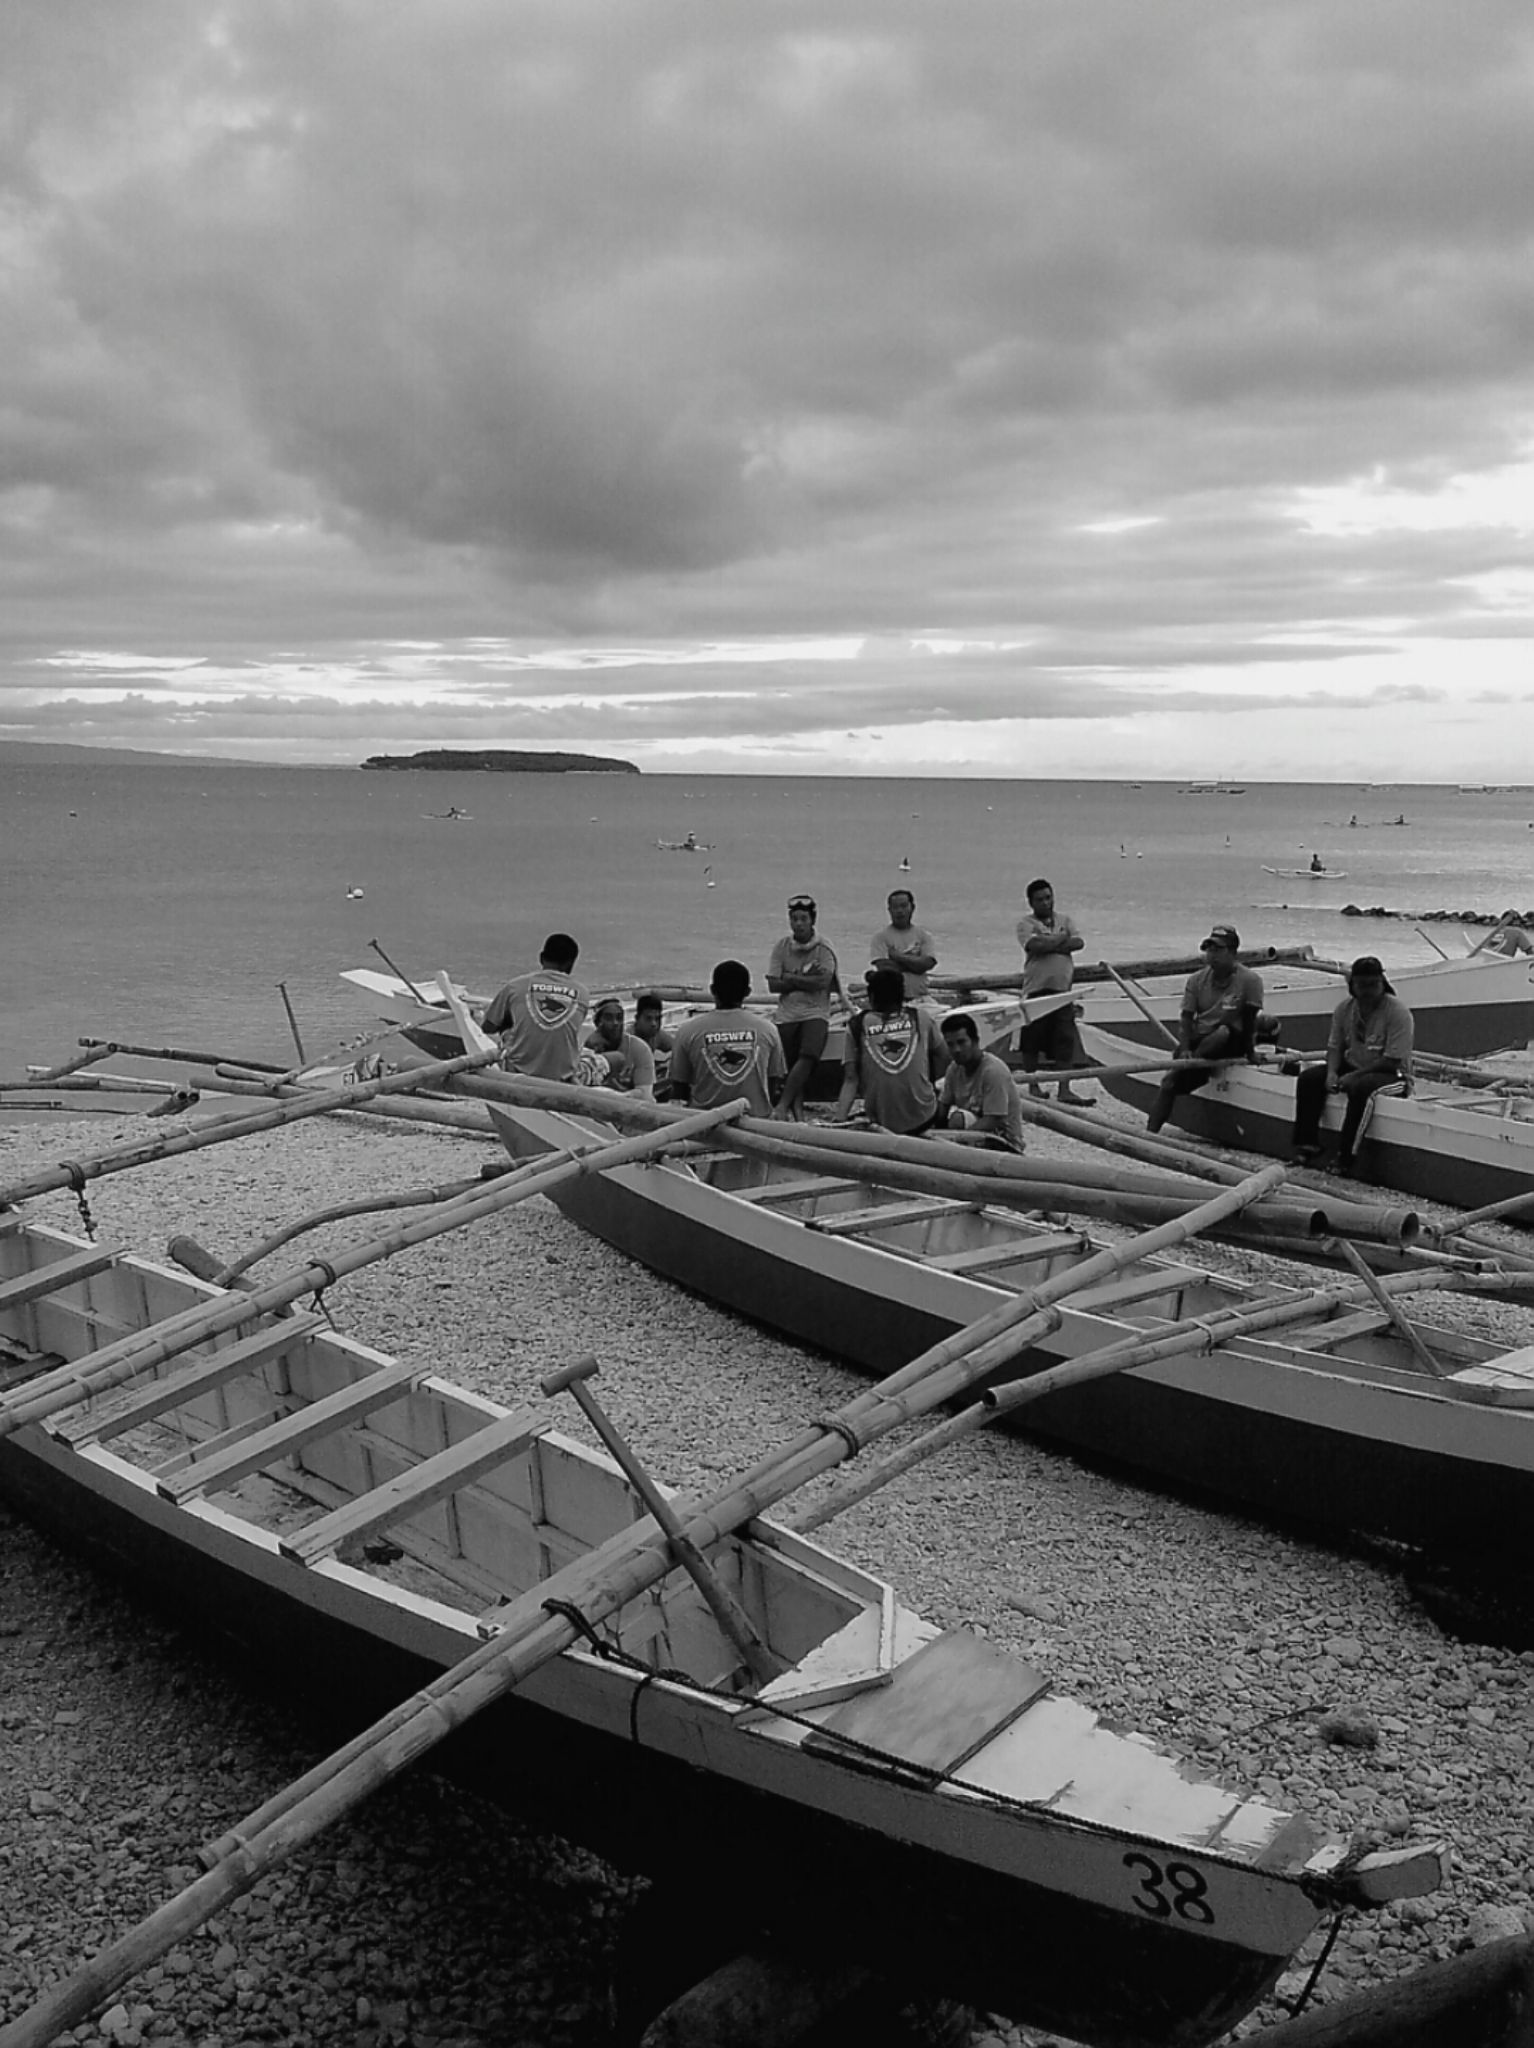 Fisherfolks by jssacaben